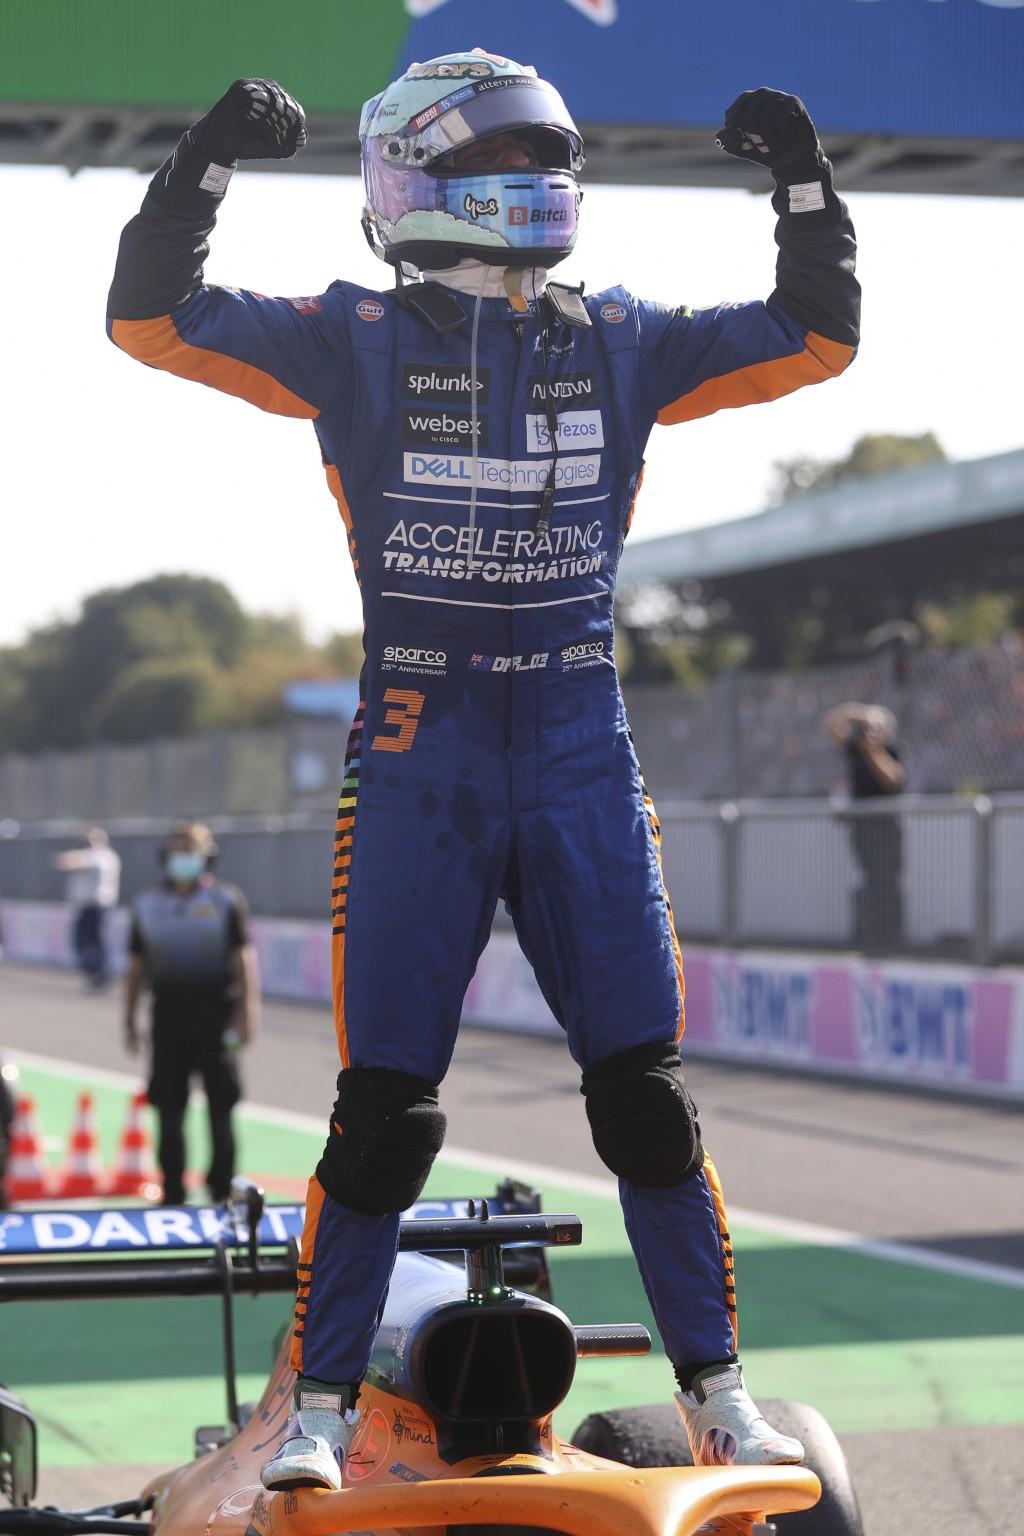 Mclaren driver Daniel Ricciardo of Australia celebrates after winning the Italian Formula One Grand Prix, at Monza racetrack, in Monza, Italy, Sunday,...